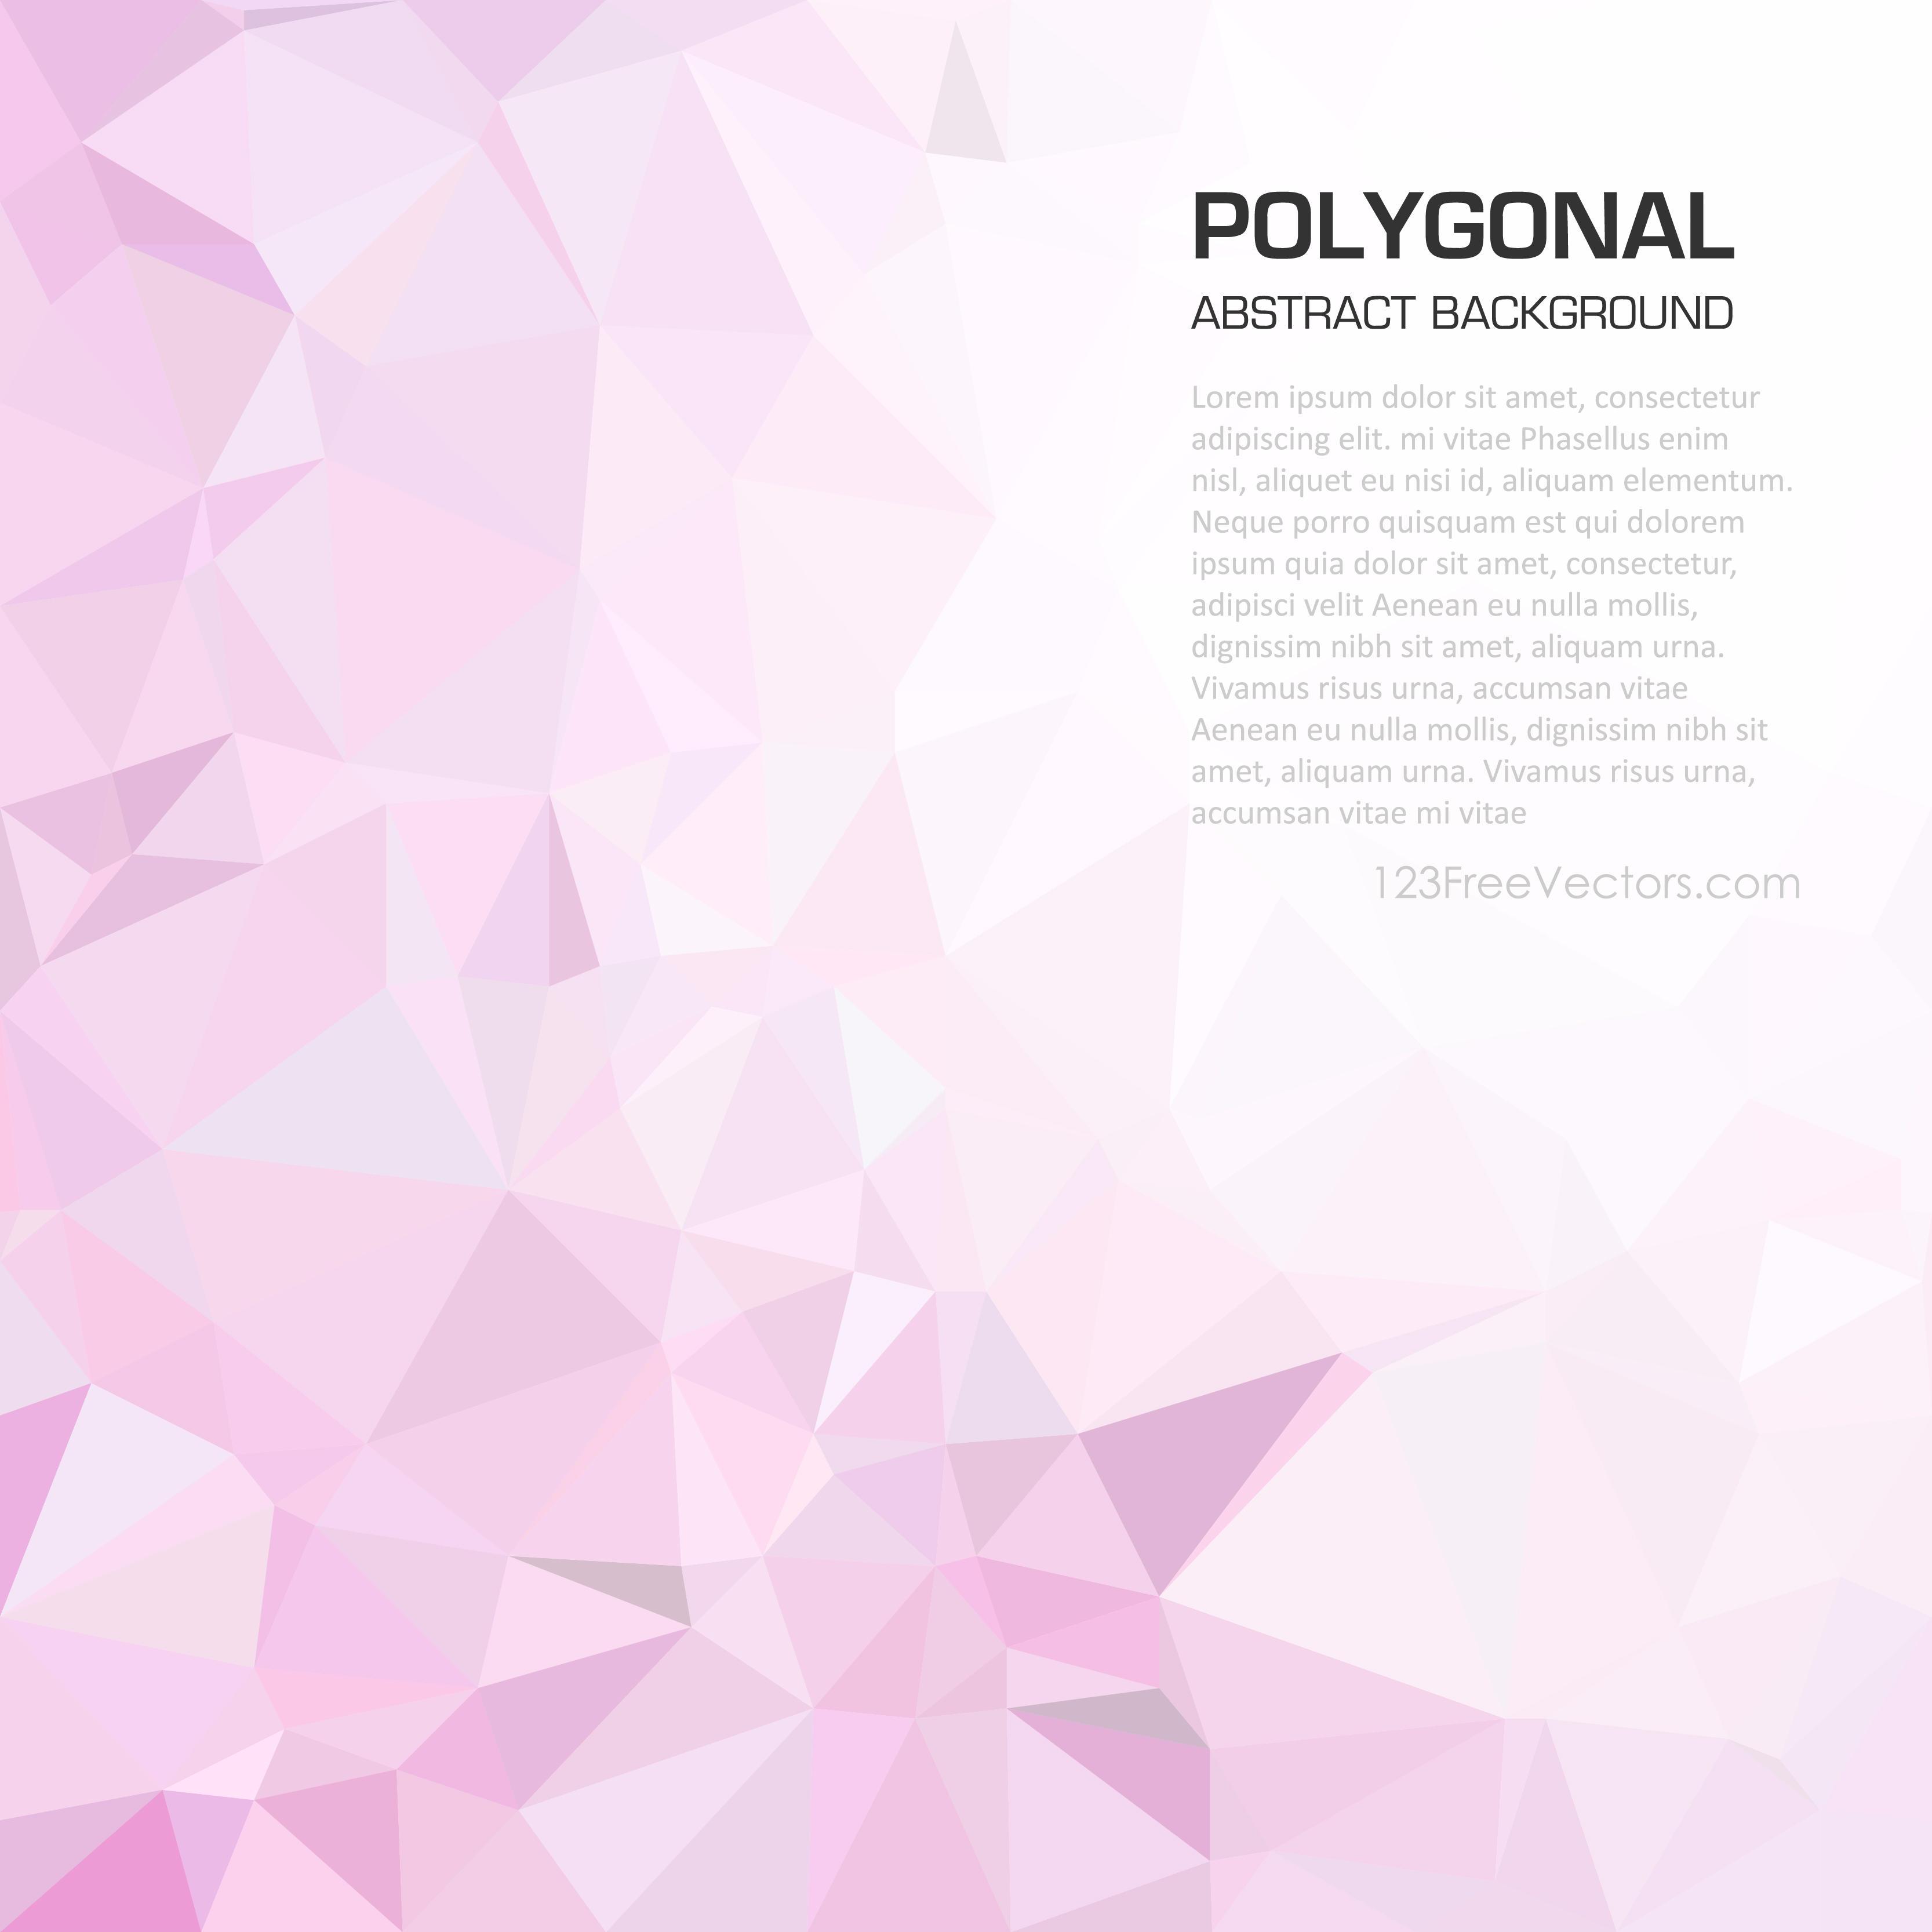 Light Pink Abstract Polygonal Background Illustrator